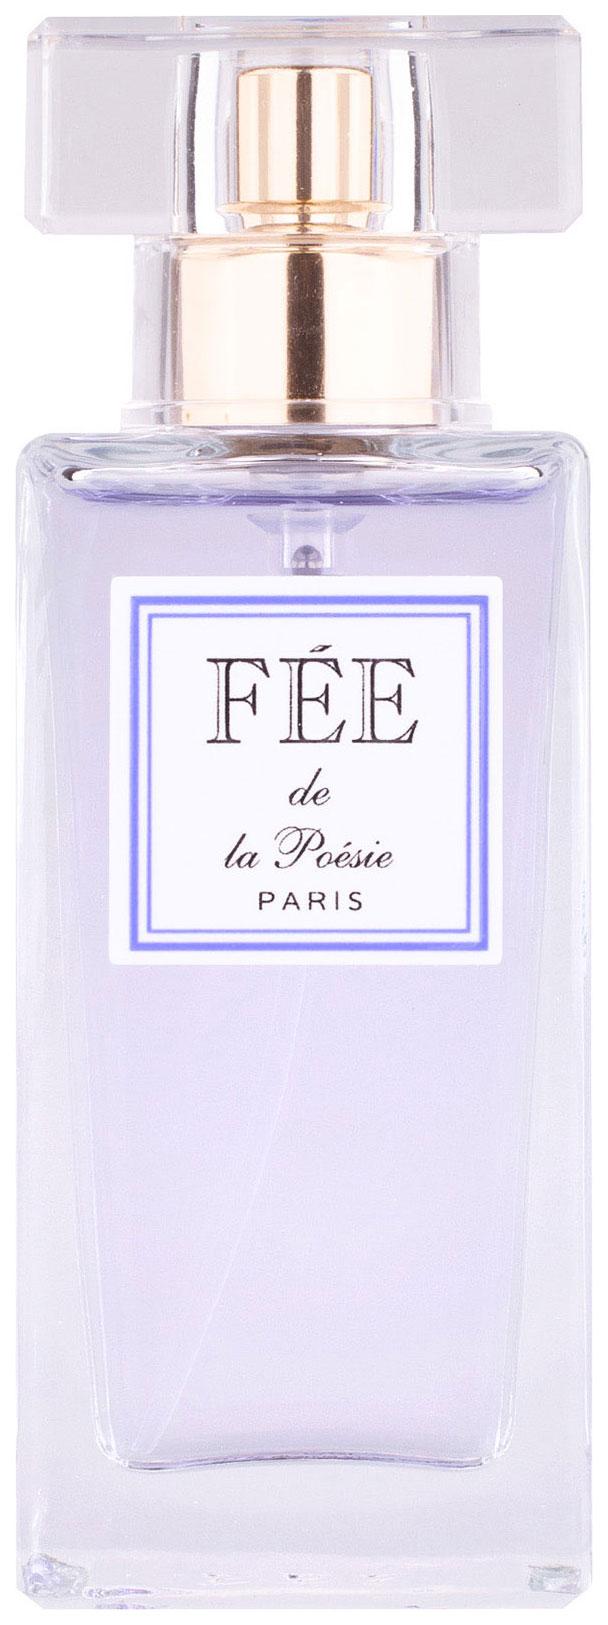 Парфюмерная вода Fee Fée de la Poésie